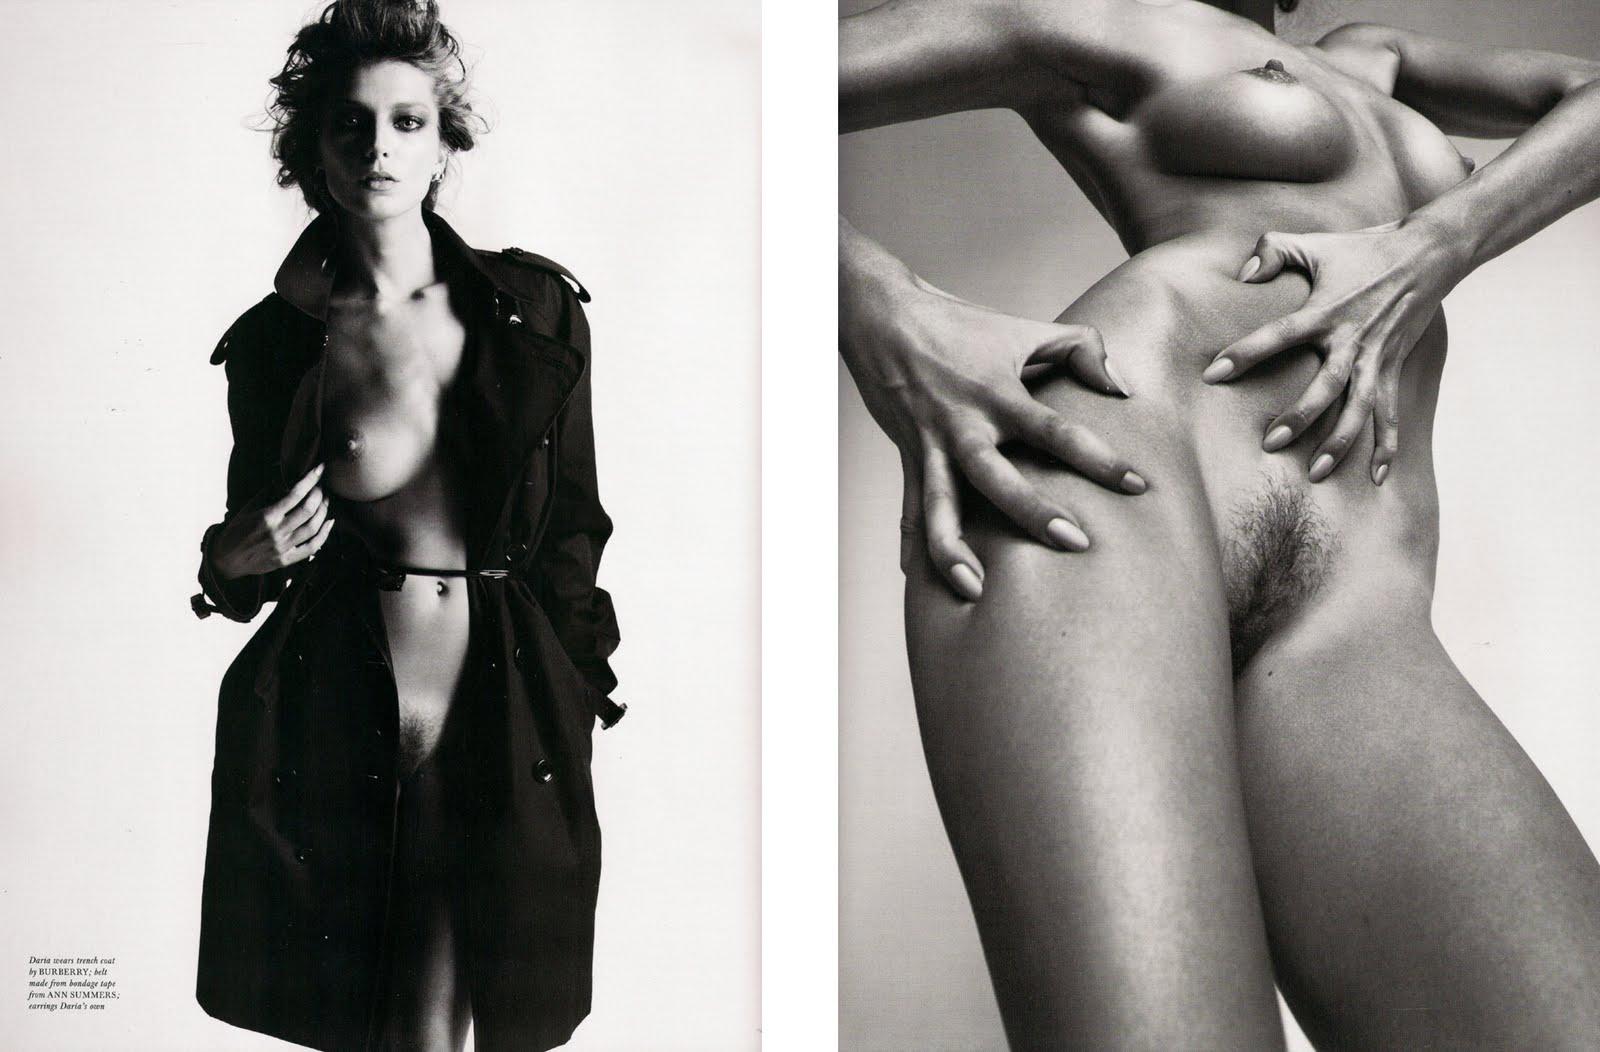 http://4.bp.blogspot.com/-StD0N5Ir8XU/TZnMMlf-AsI/AAAAAAAAJx8/epieT-HdULc/s1600/mert-fashionicons_fashionproduction_2.jpg